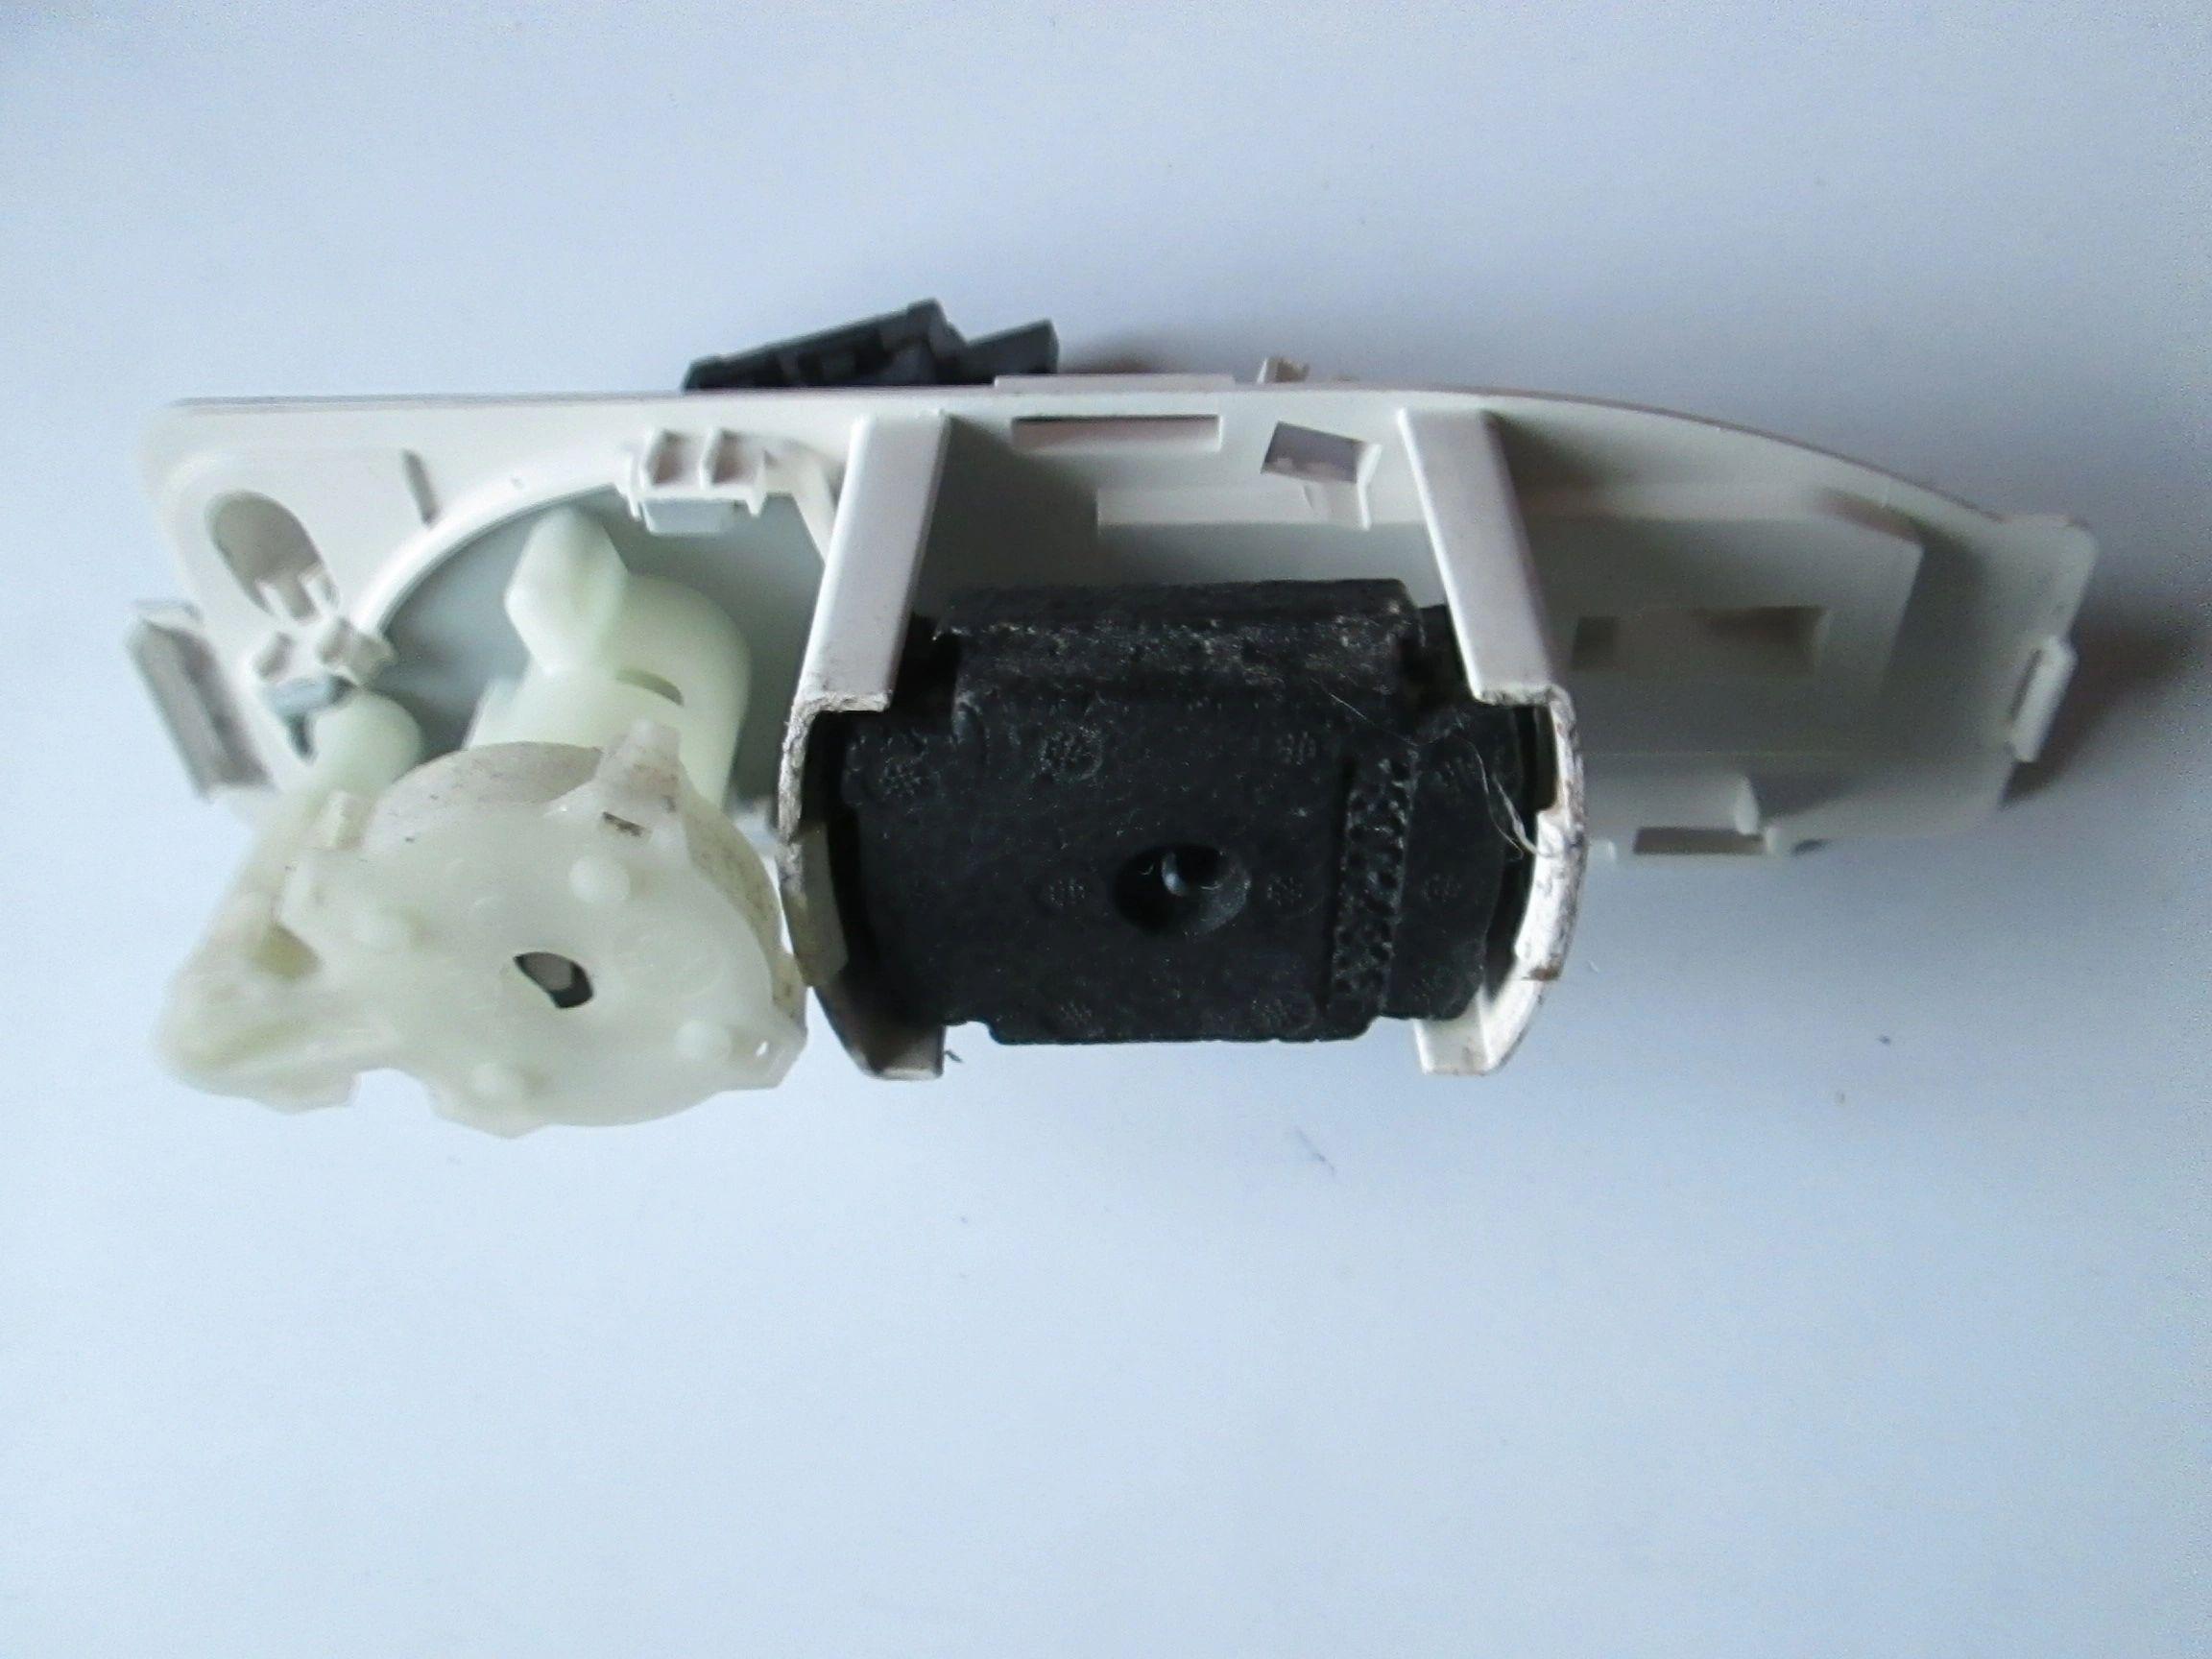 Water Pump Condenser for HOTPOINT TCM570G TCM570P TCM580G TCM580P Tumble Dryer